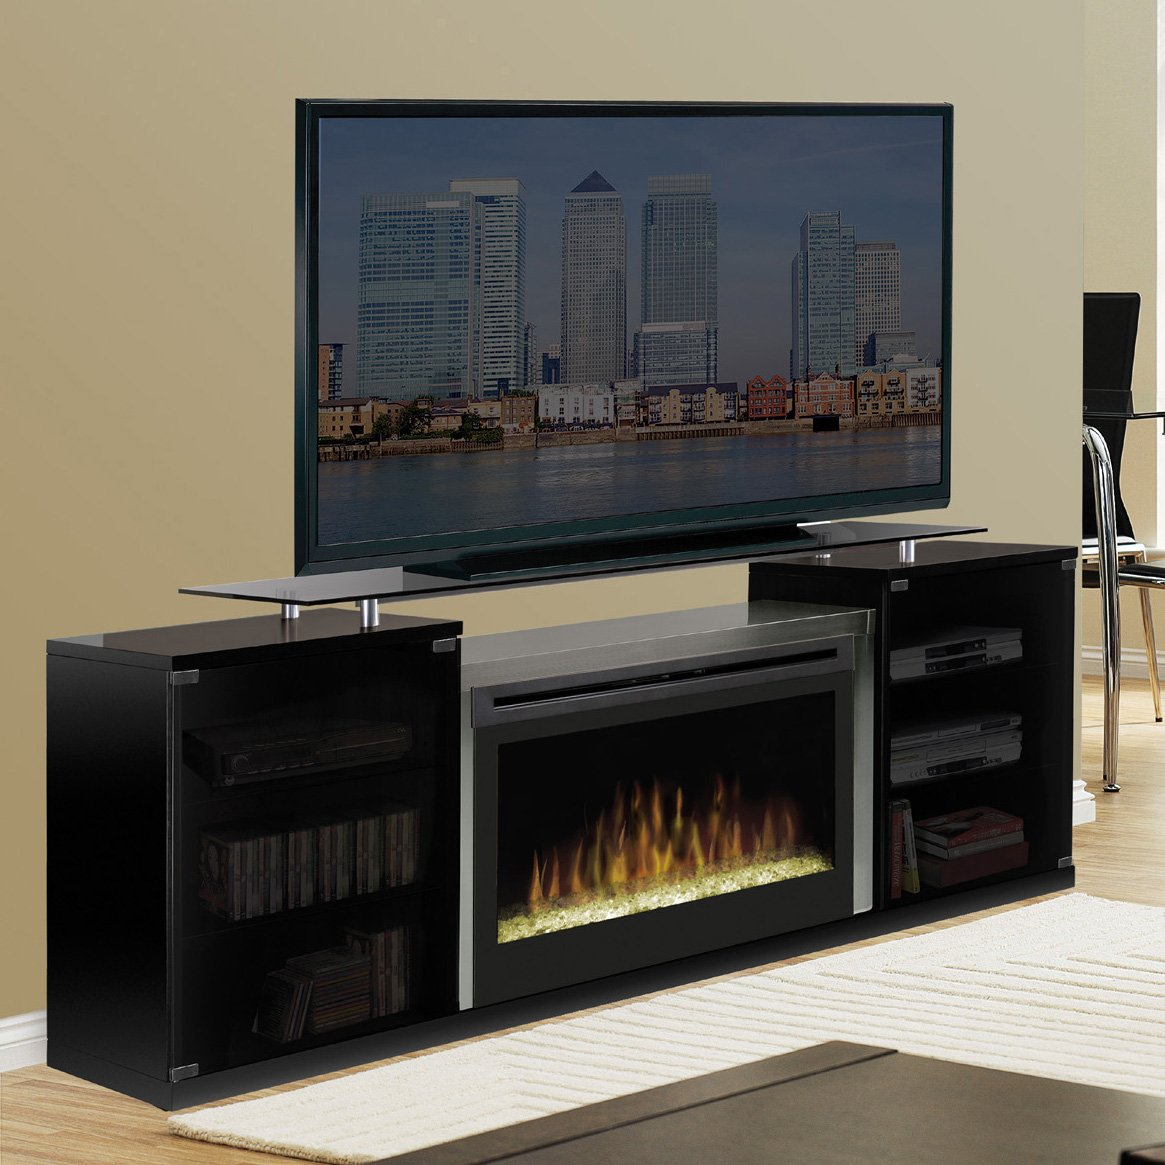 Electric Hot Tubs Fireplaces Patio Furniture Heat 39 N Sweep Okemos Michigan